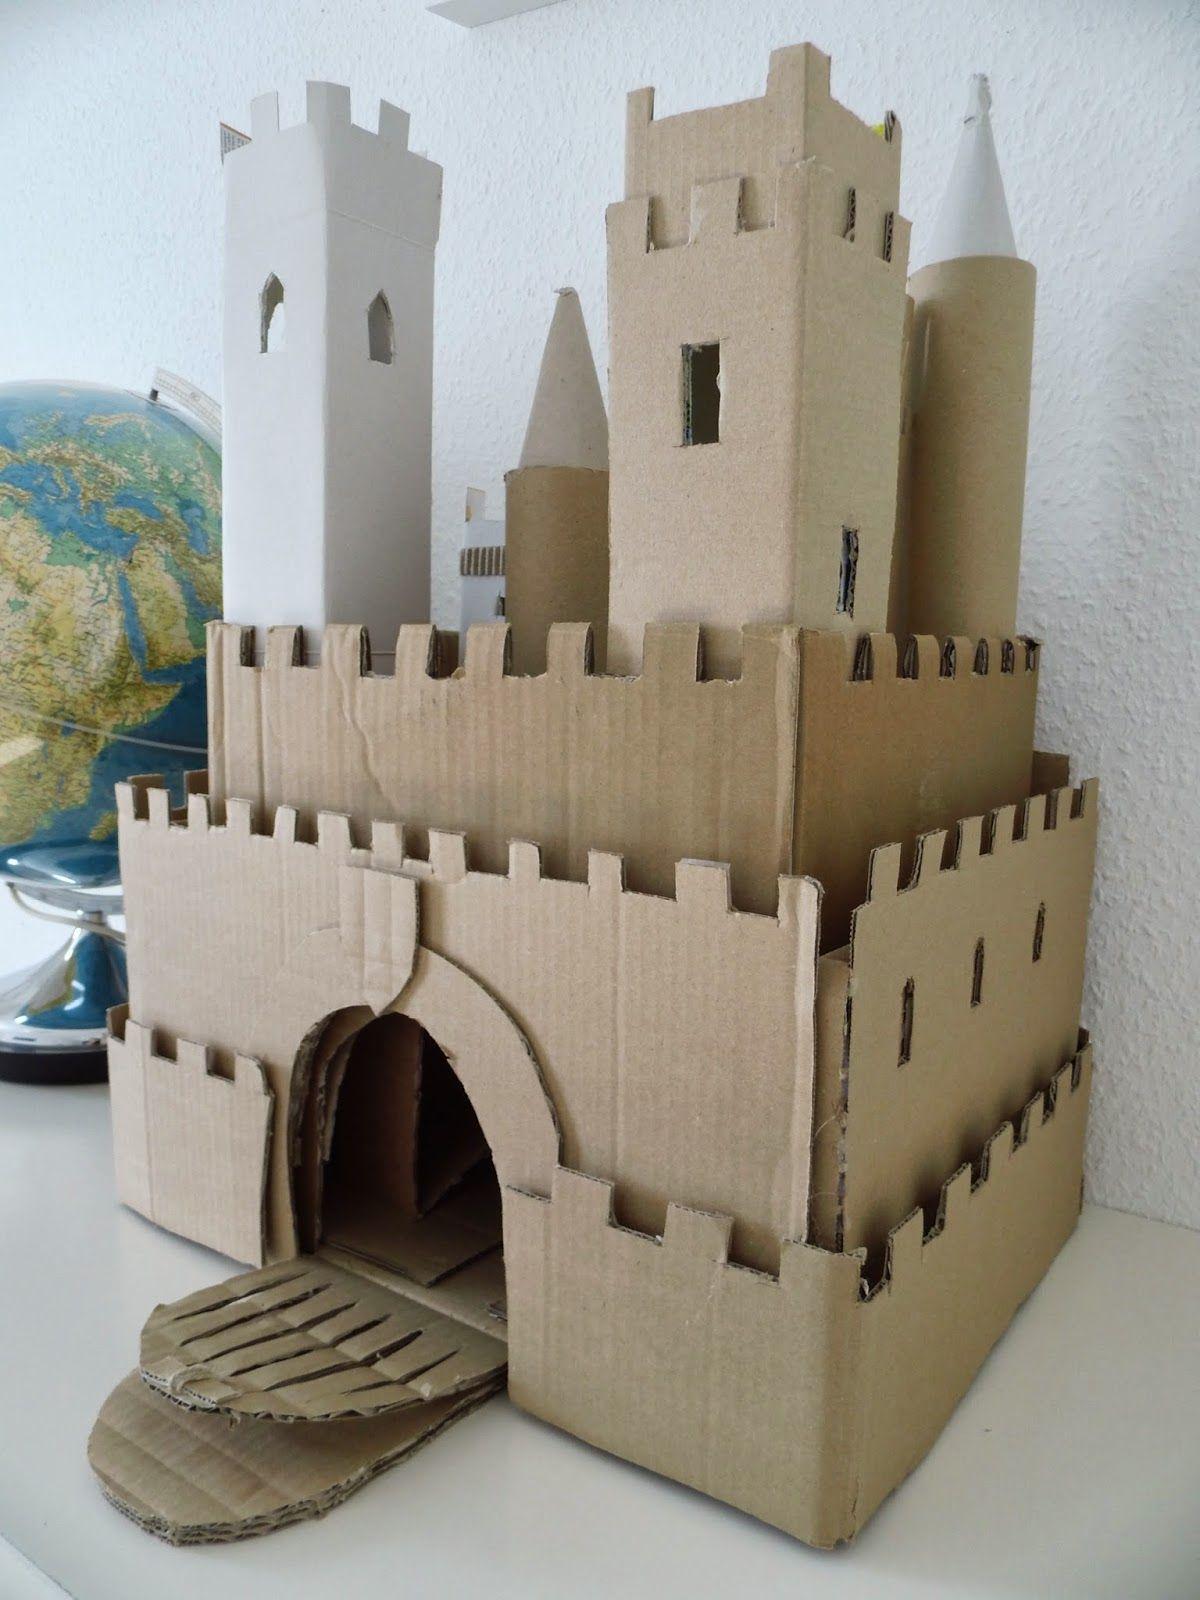 Diy Cardbox Castle Ritterburg Aus Pappe Just Paper